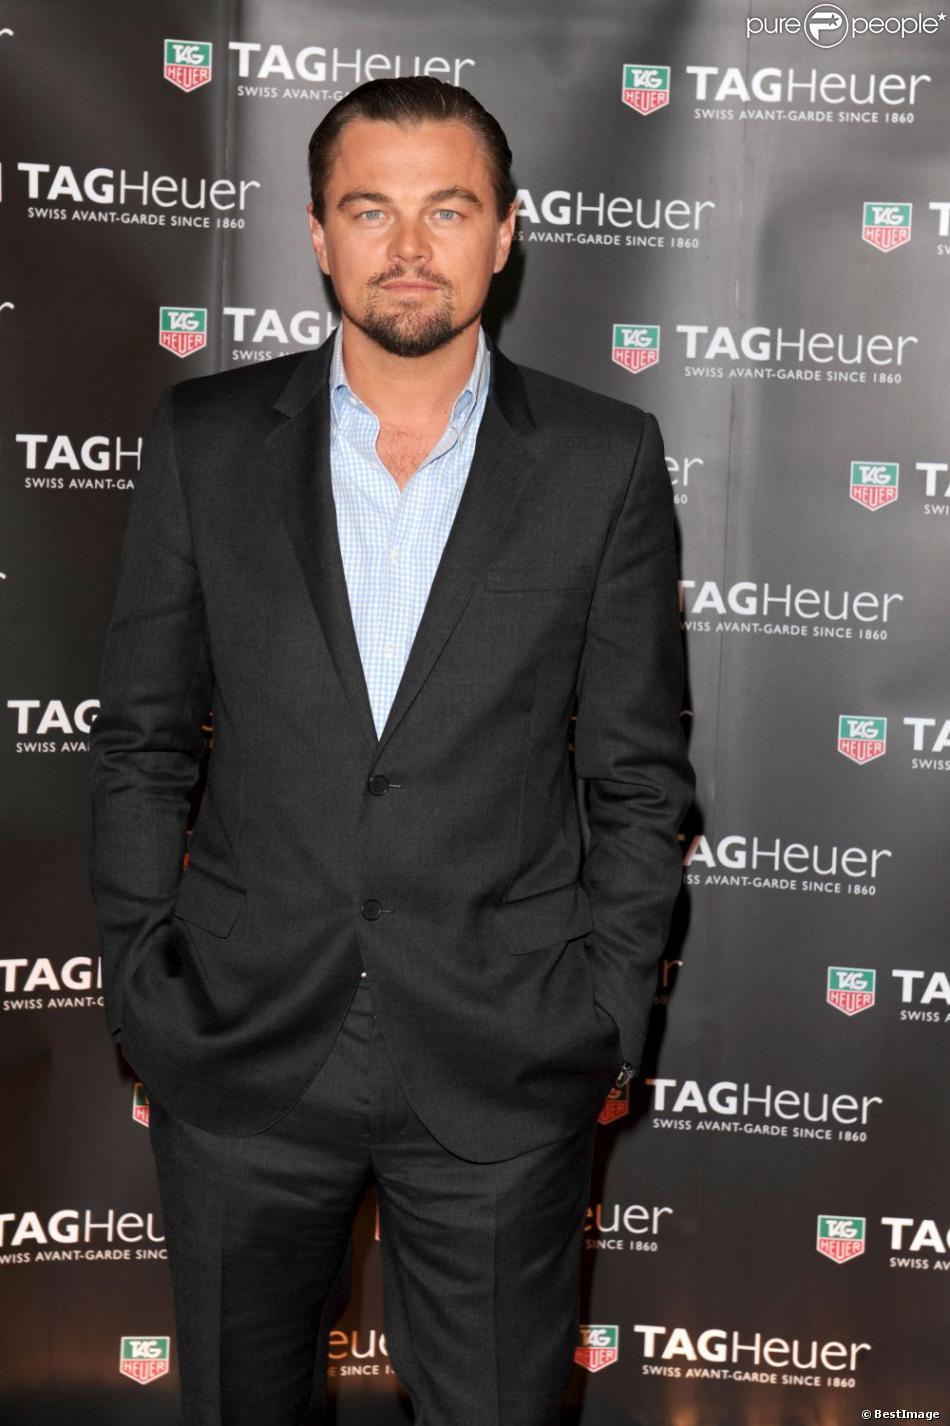 Leonardo DiCaprio lors de la soirée Tag Heuer à Monte-Carlo le 25 mai 2013